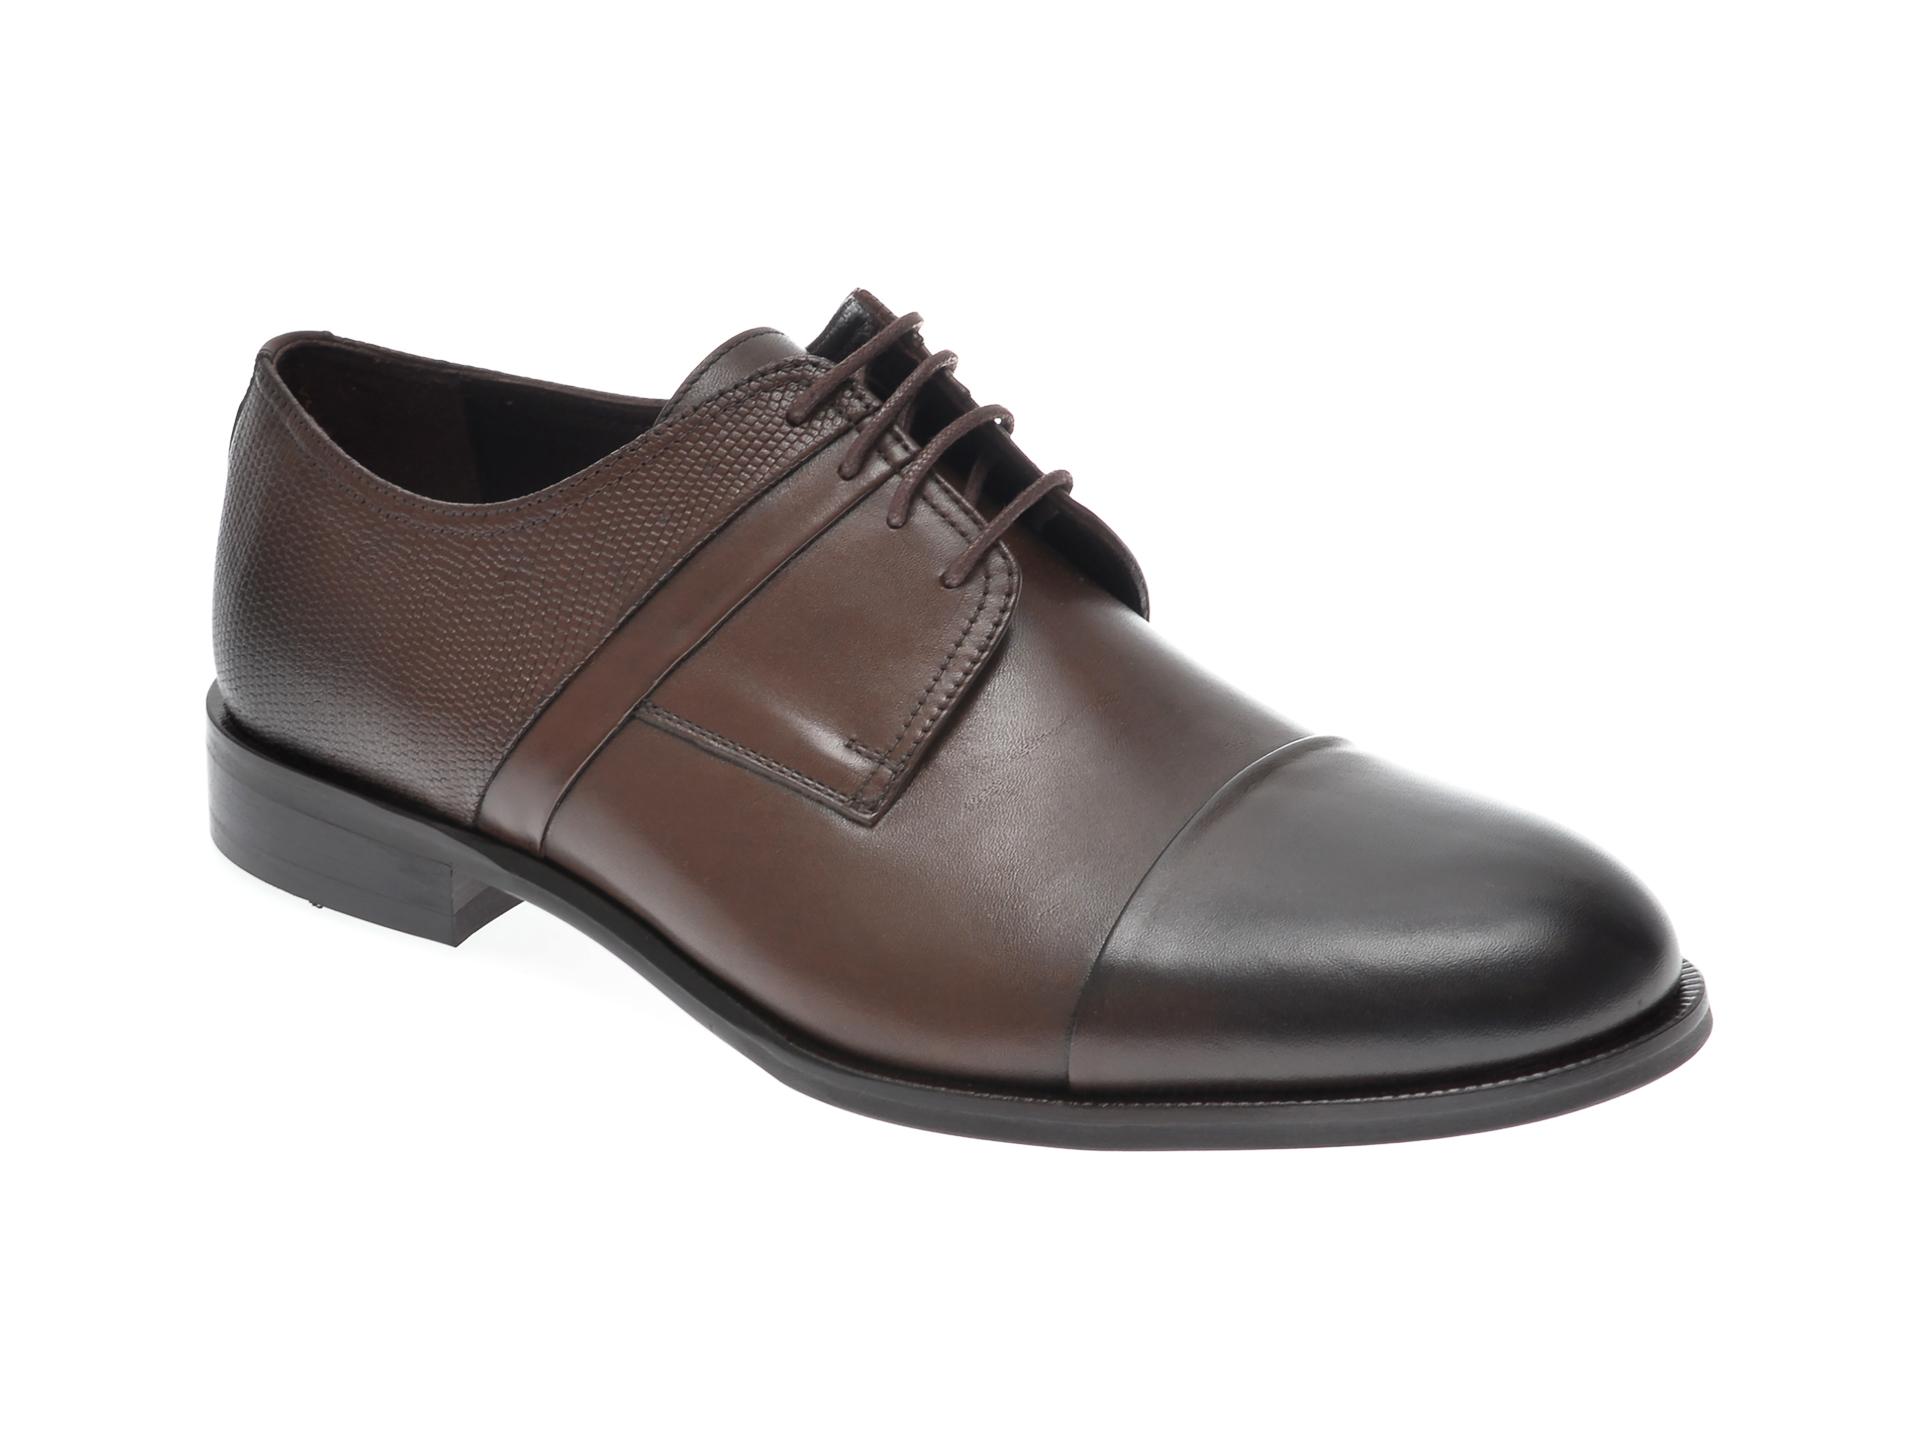 Pantofi OTTER maro, 7842, din piele naturala imagine